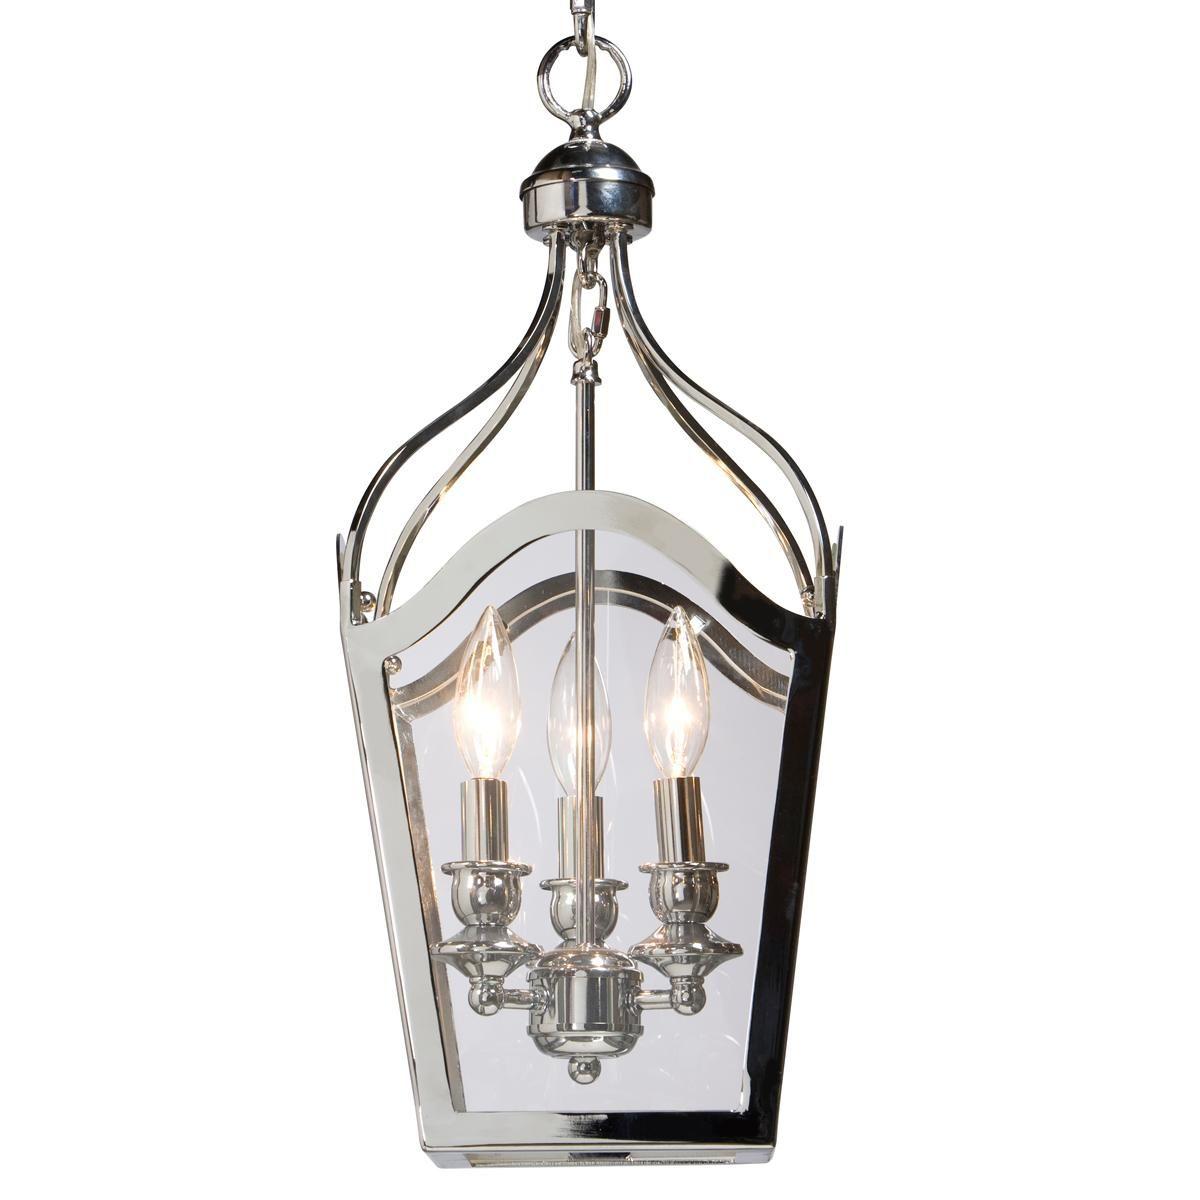 Edwardian hallway lighting  Arched Curvilinear Hanging Lantern  Kichens  Pinterest  Hanging